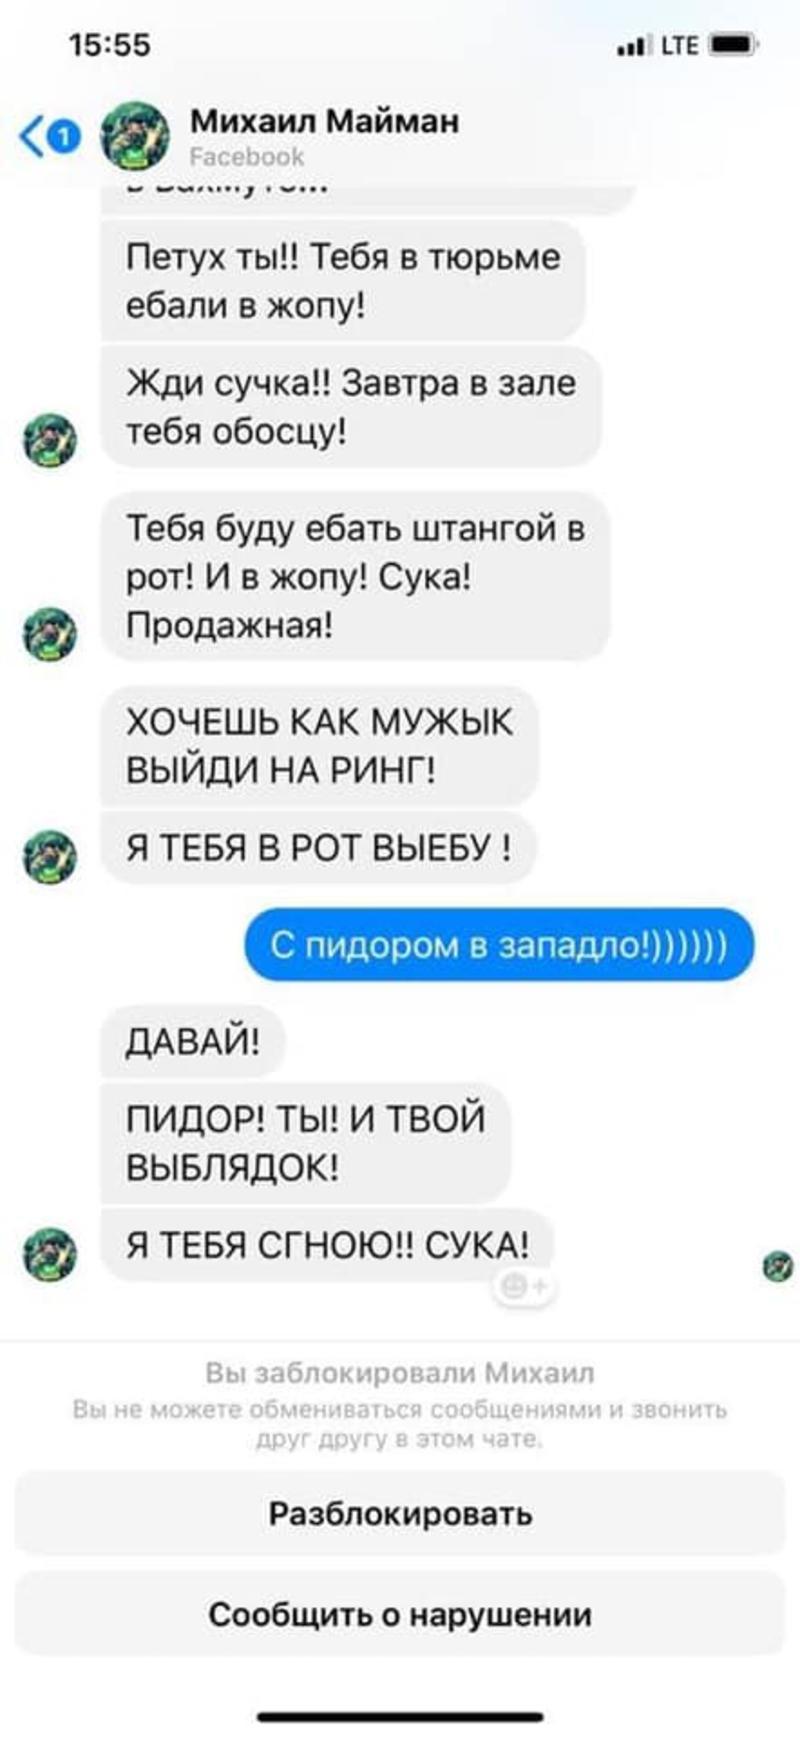 facebook.com/kivailya